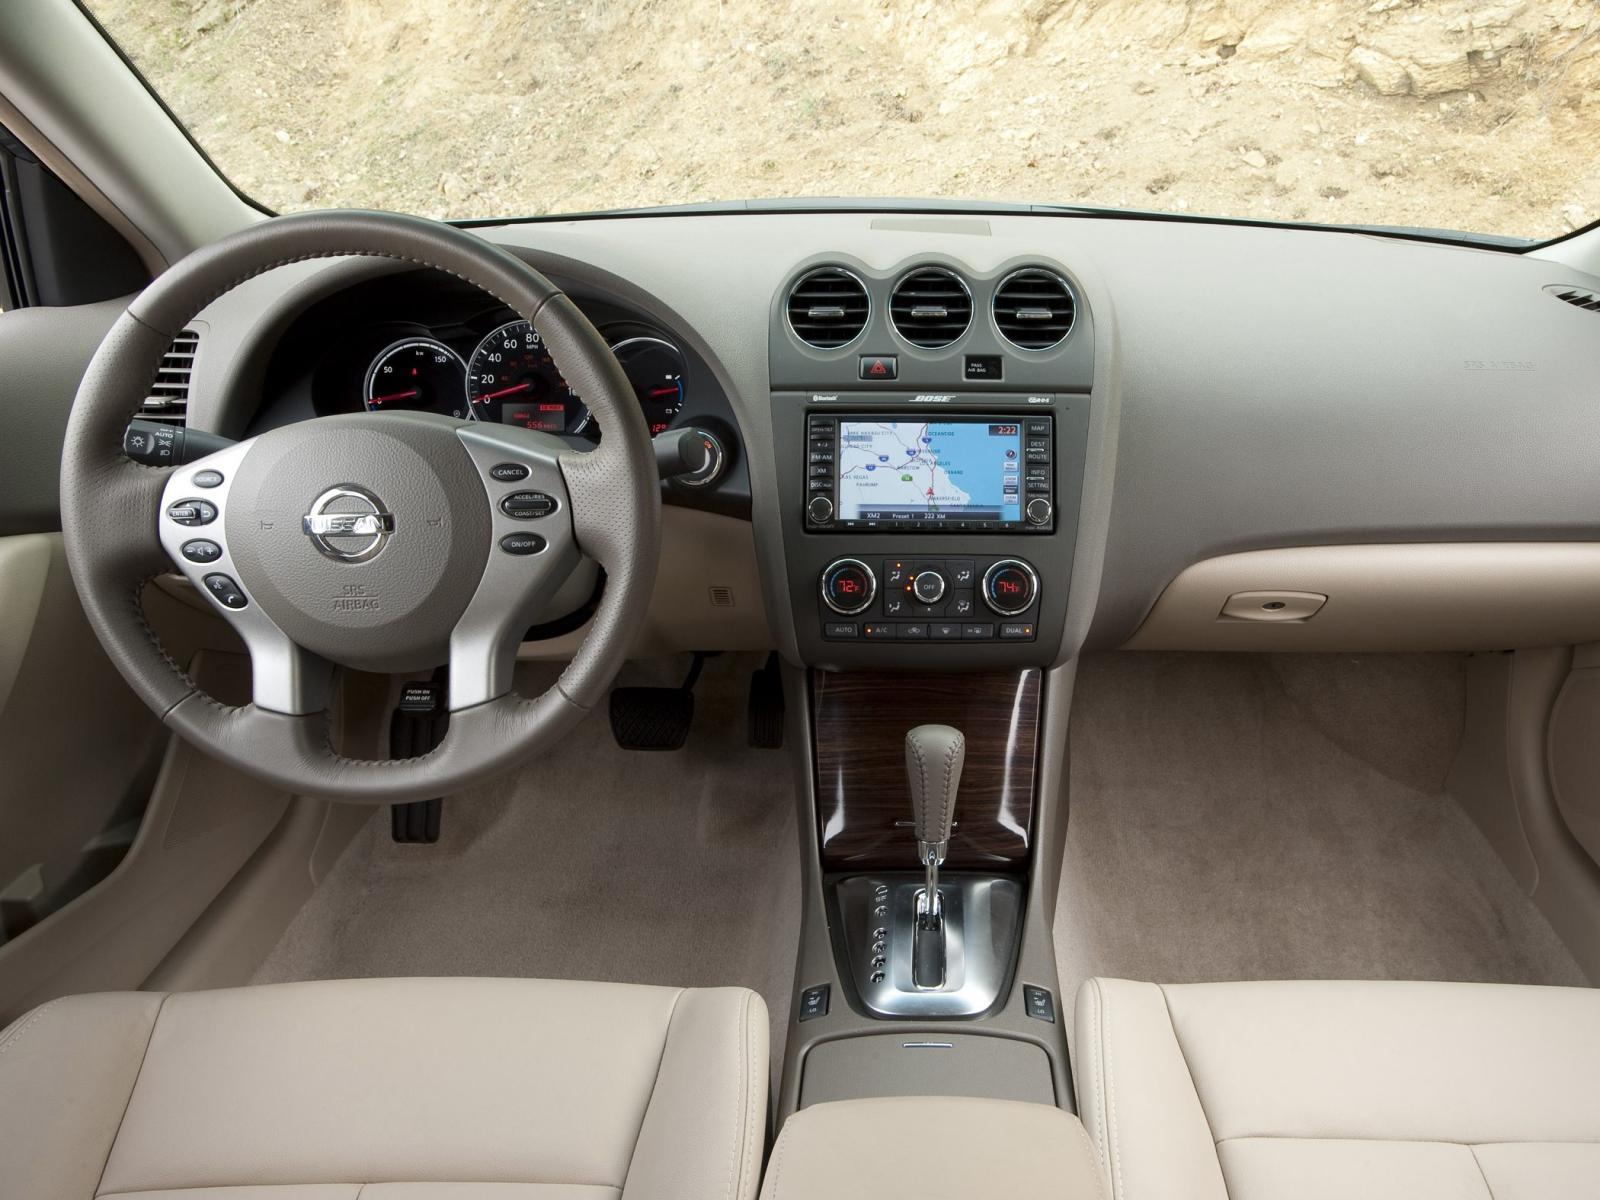 800 1024 1280 1600 Origin 2008 Nissan Altima ...